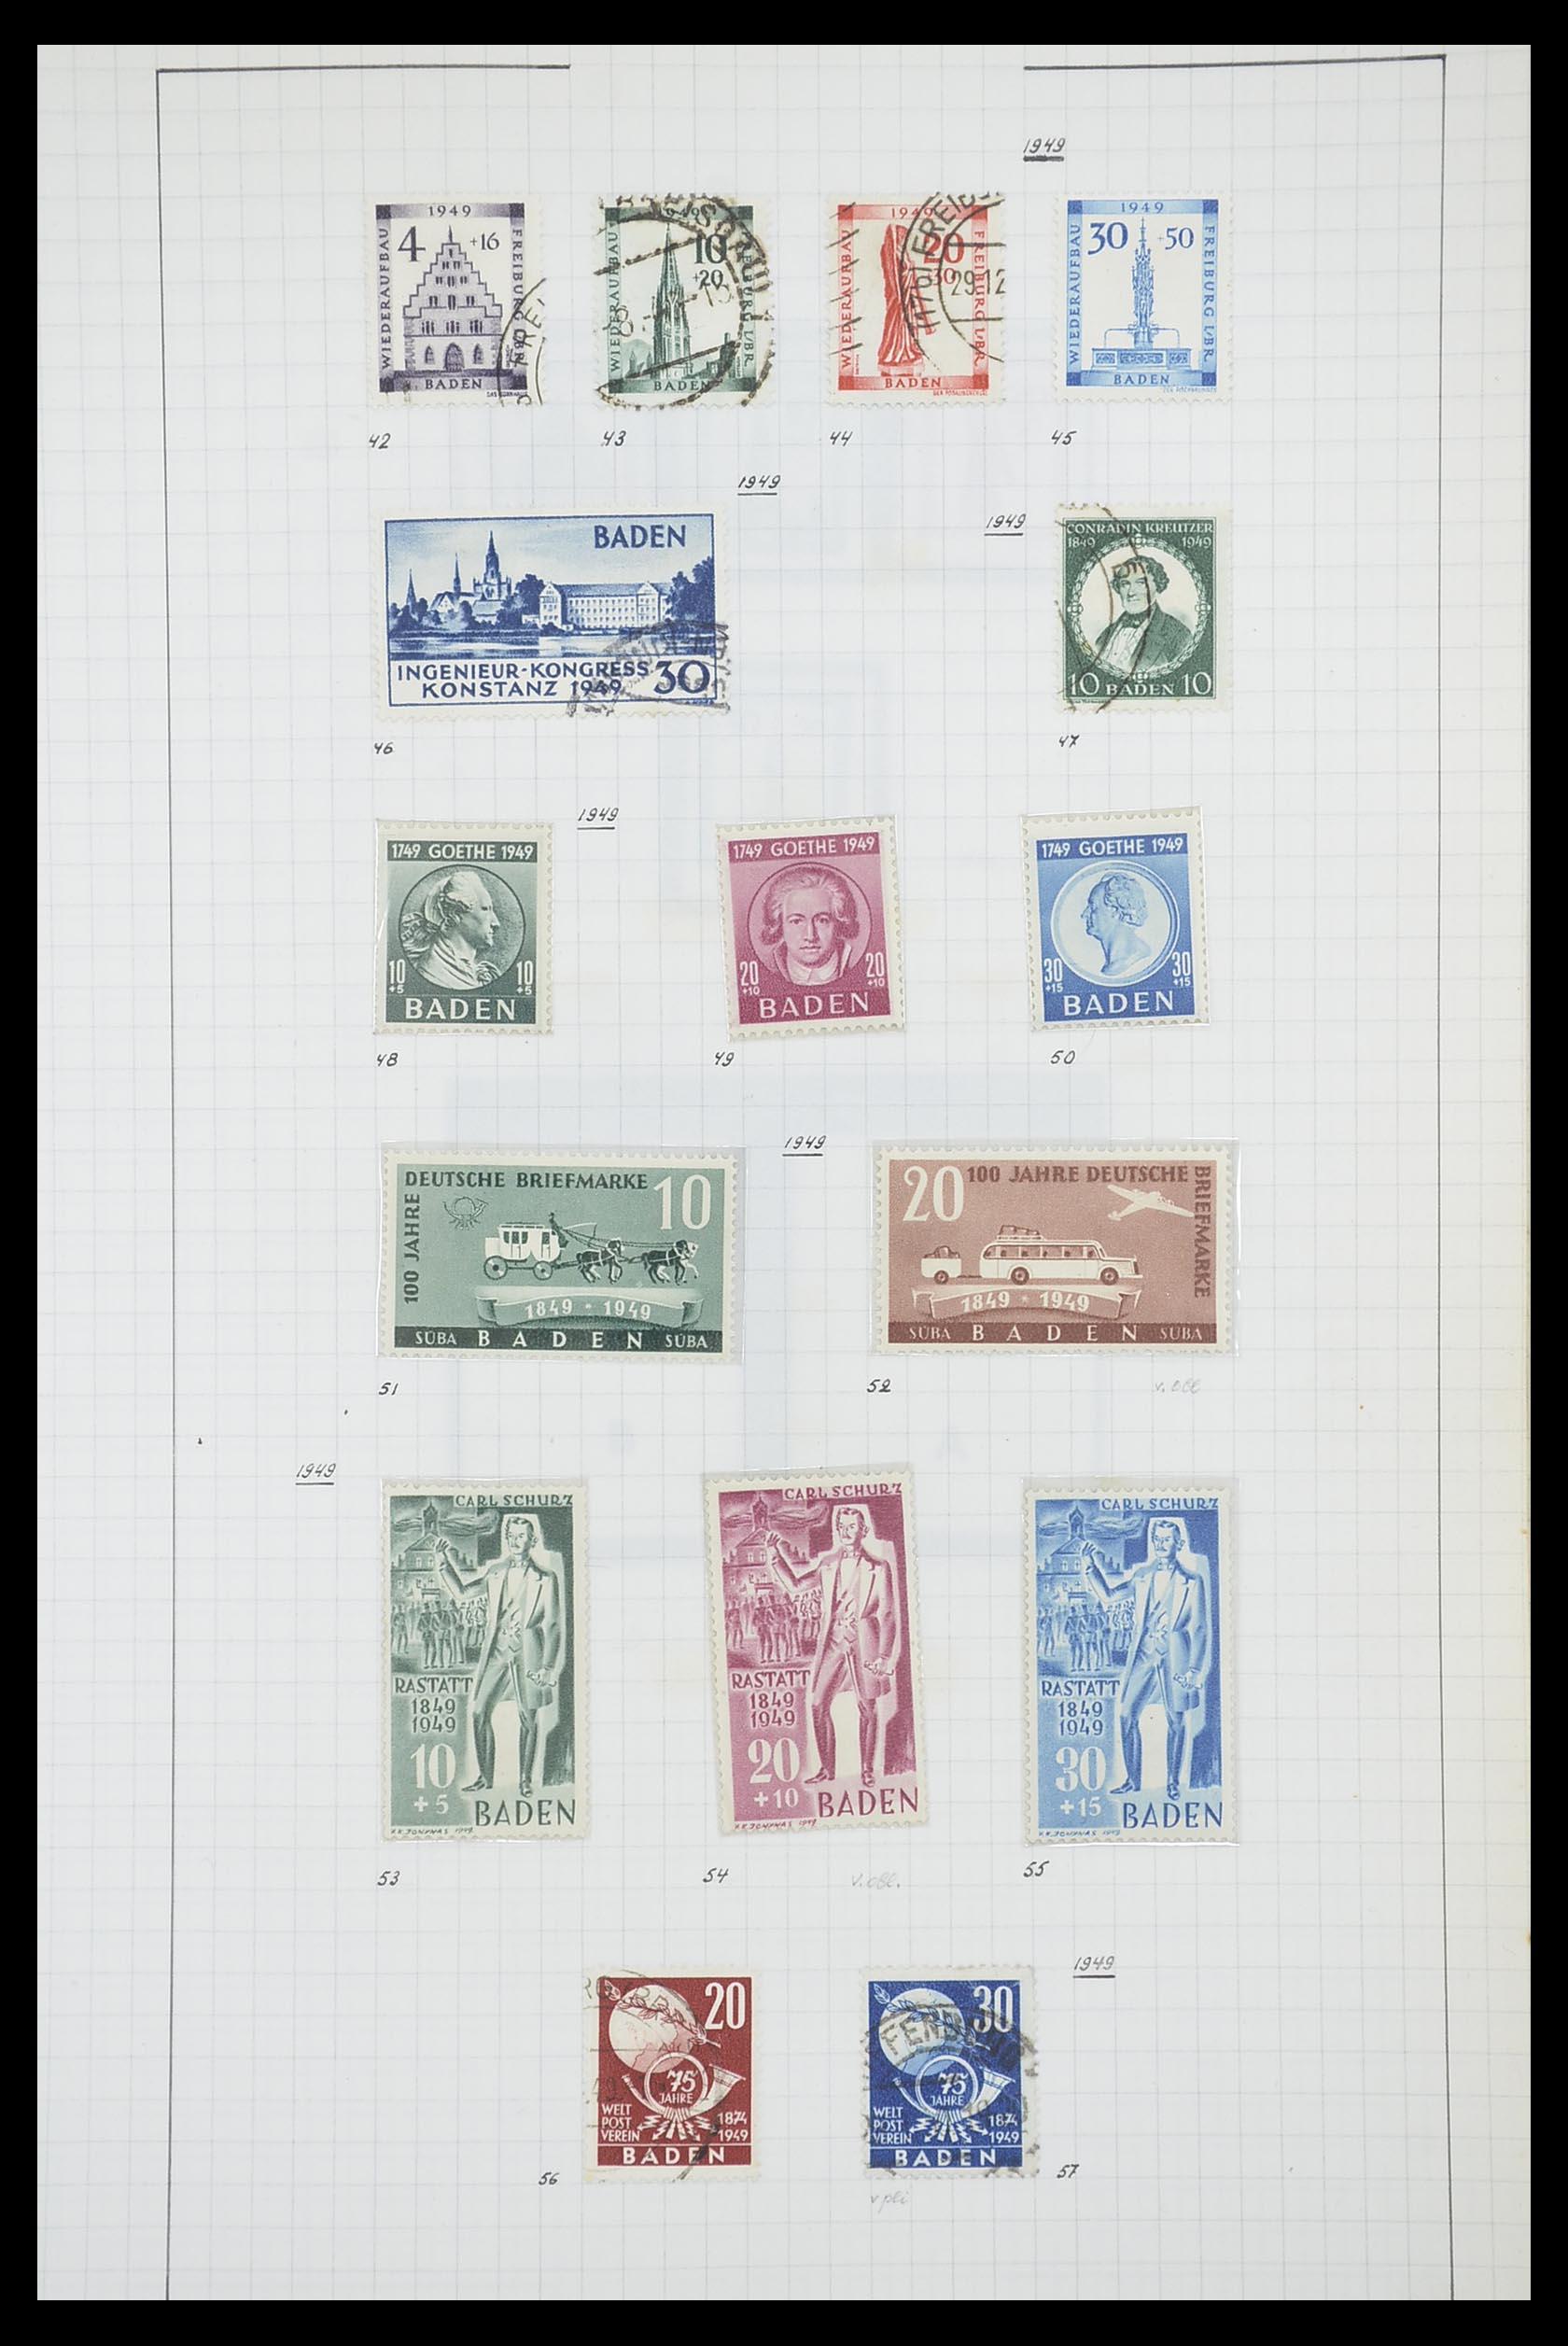 33864 010 - Postzegelverzameling 33864 Franse Zone 1945-1949.